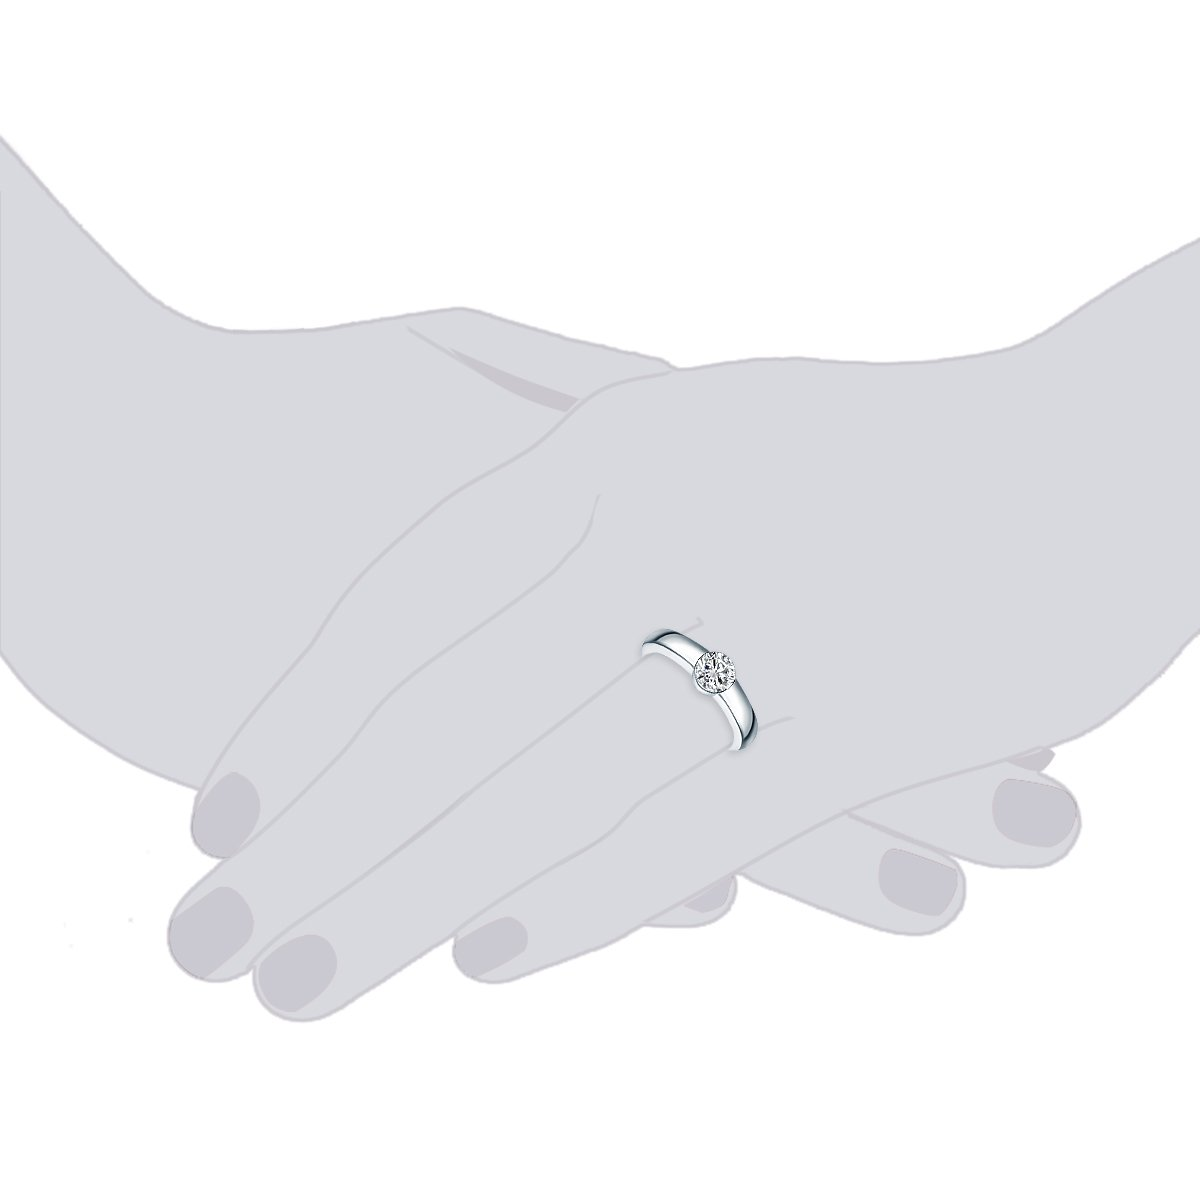 Tresor 1934 Anillo de mujer Jewels - Plata de ley cristales de swarovski® Color Blanco - Anillo de sujeción de anillo de compromiso antrag Anillo Plata ...